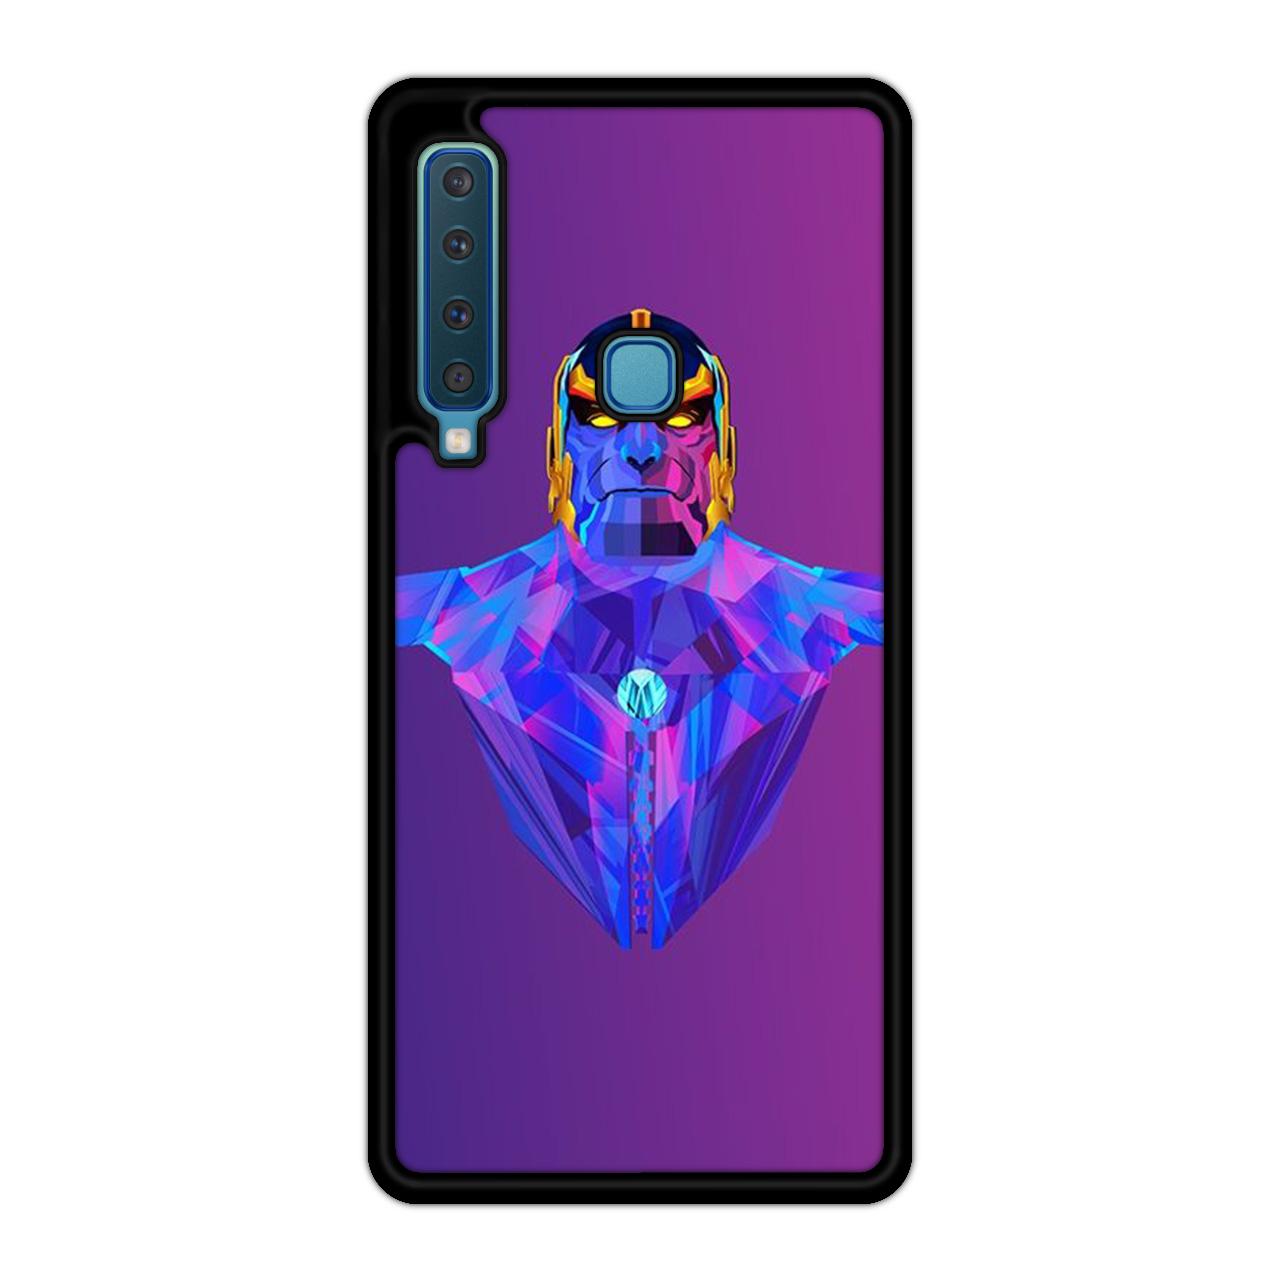 کاور آکام مدل Aanin2919 مناسب برای گوشی موبایل سامسونگ Galaxy A9 2018